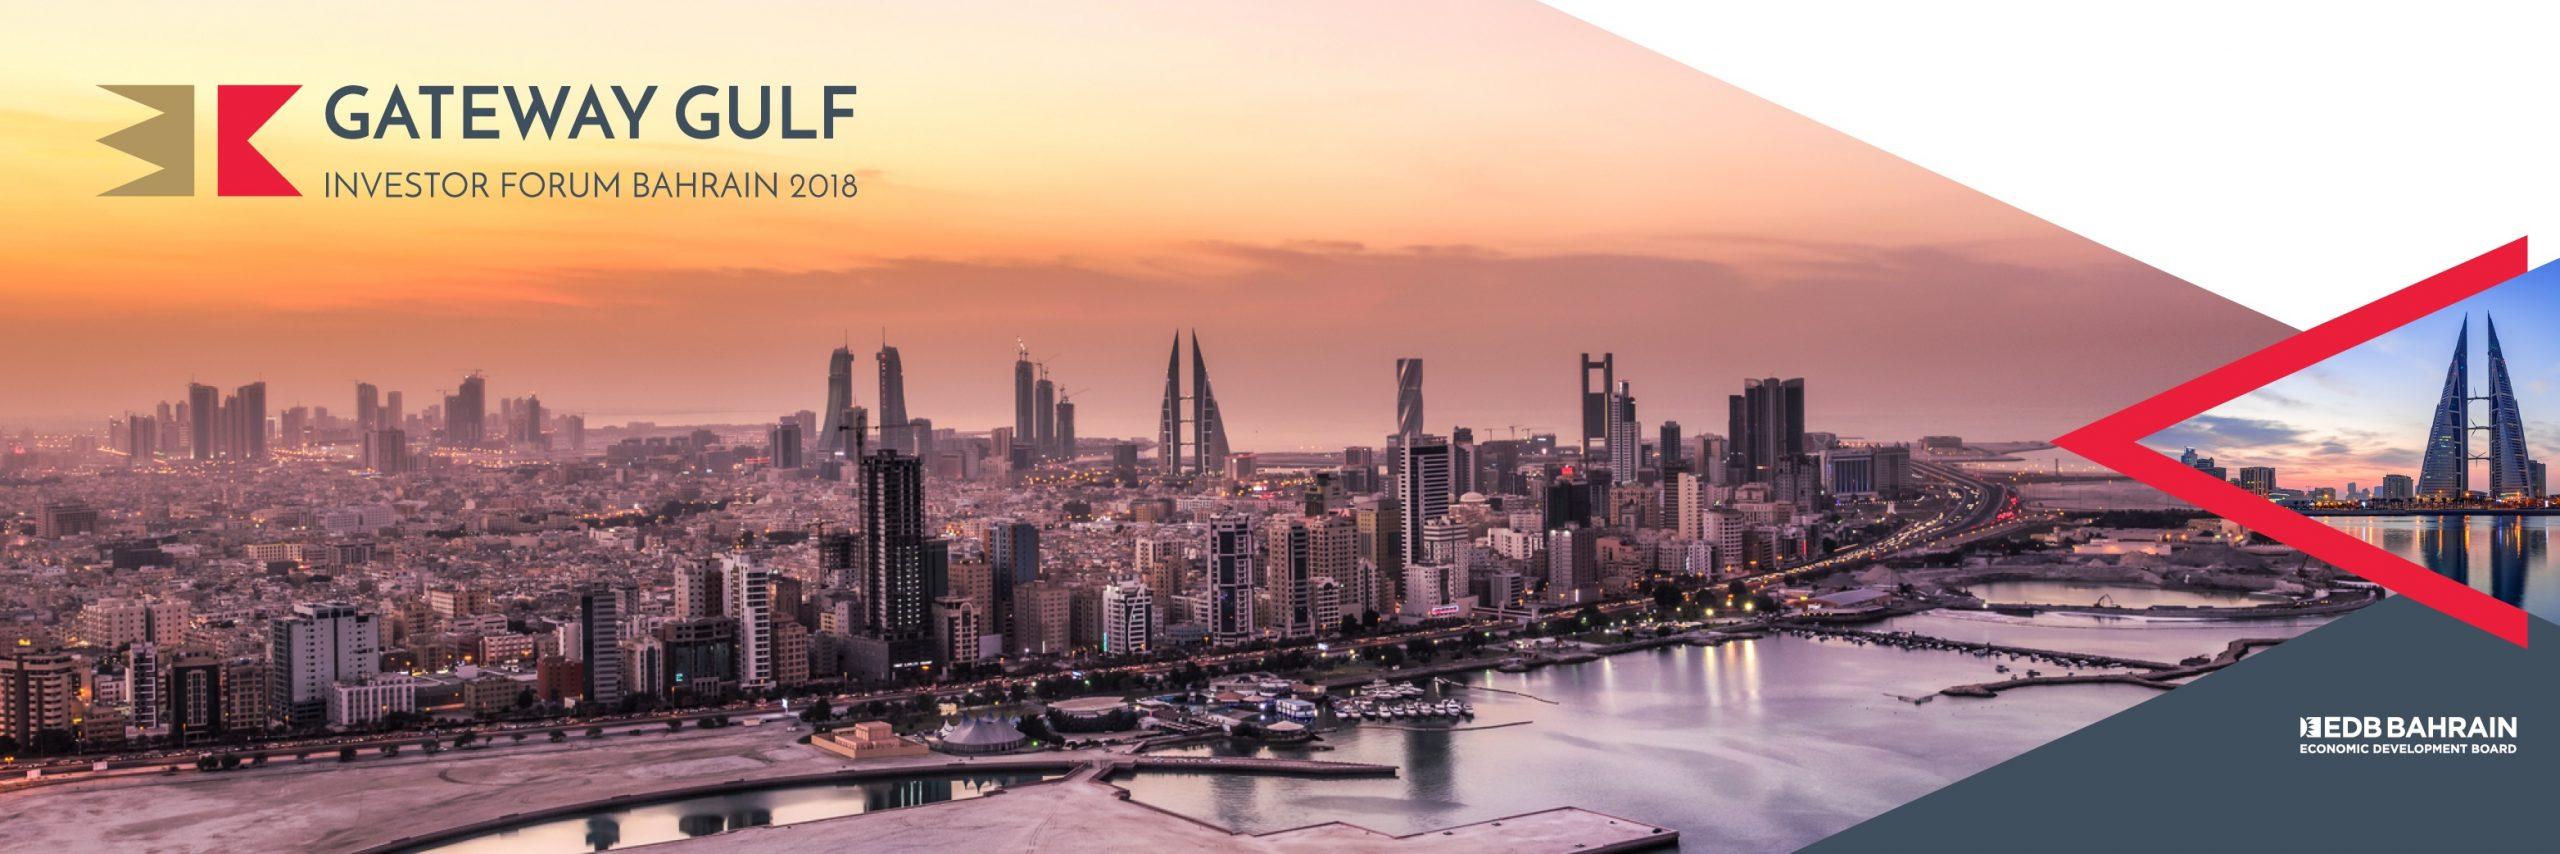 Global investors to convene in Bahrain to unlock GCC opportunities